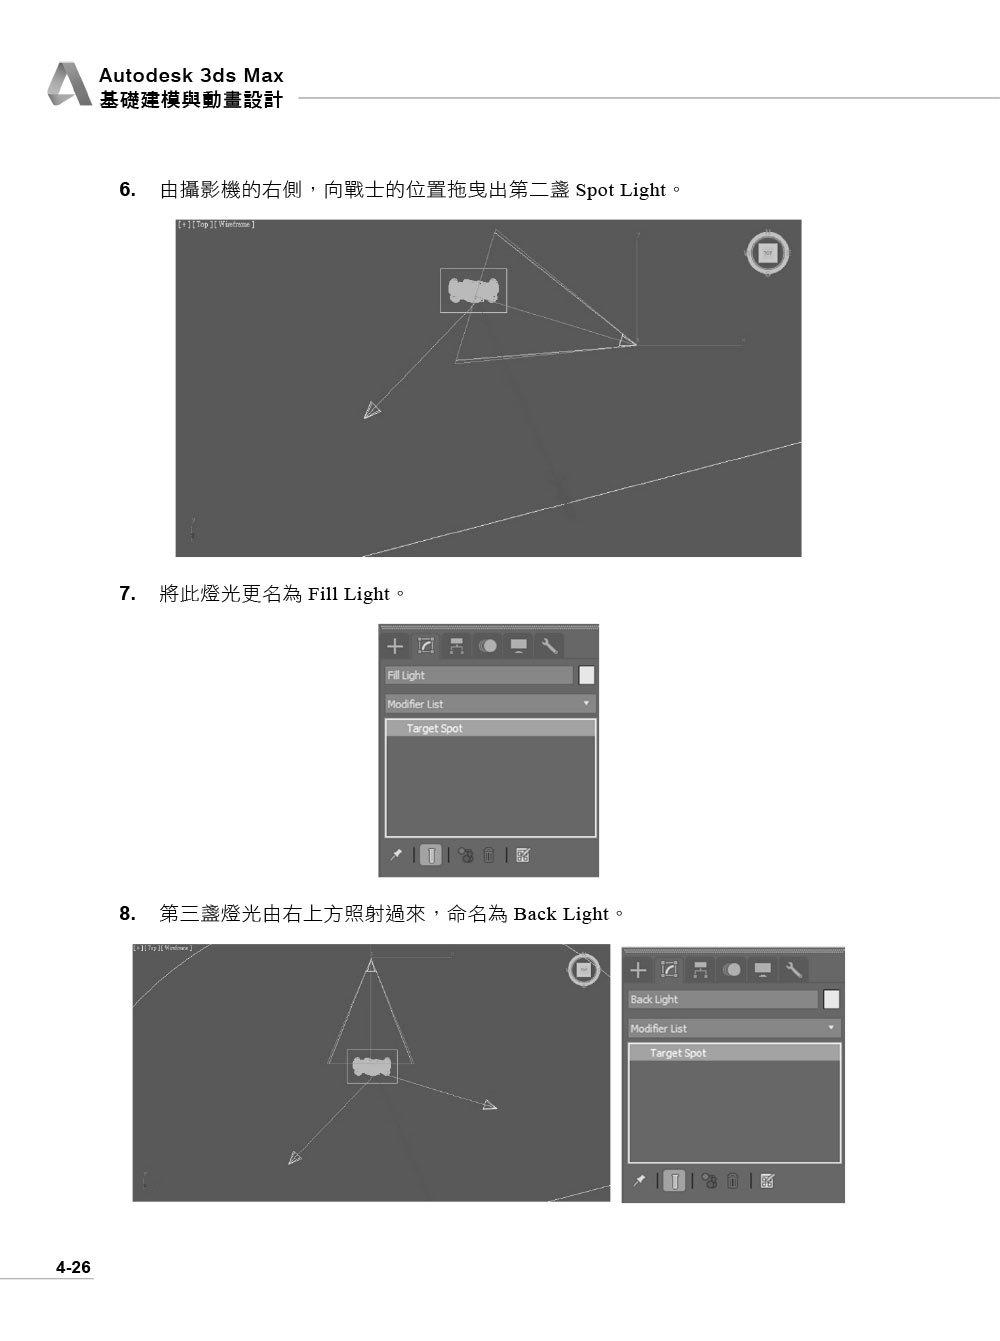 Autodesk 3ds Max 基礎建模與動畫設計 (含3ds Max 2016~2018認證模擬與解題)-preview-6